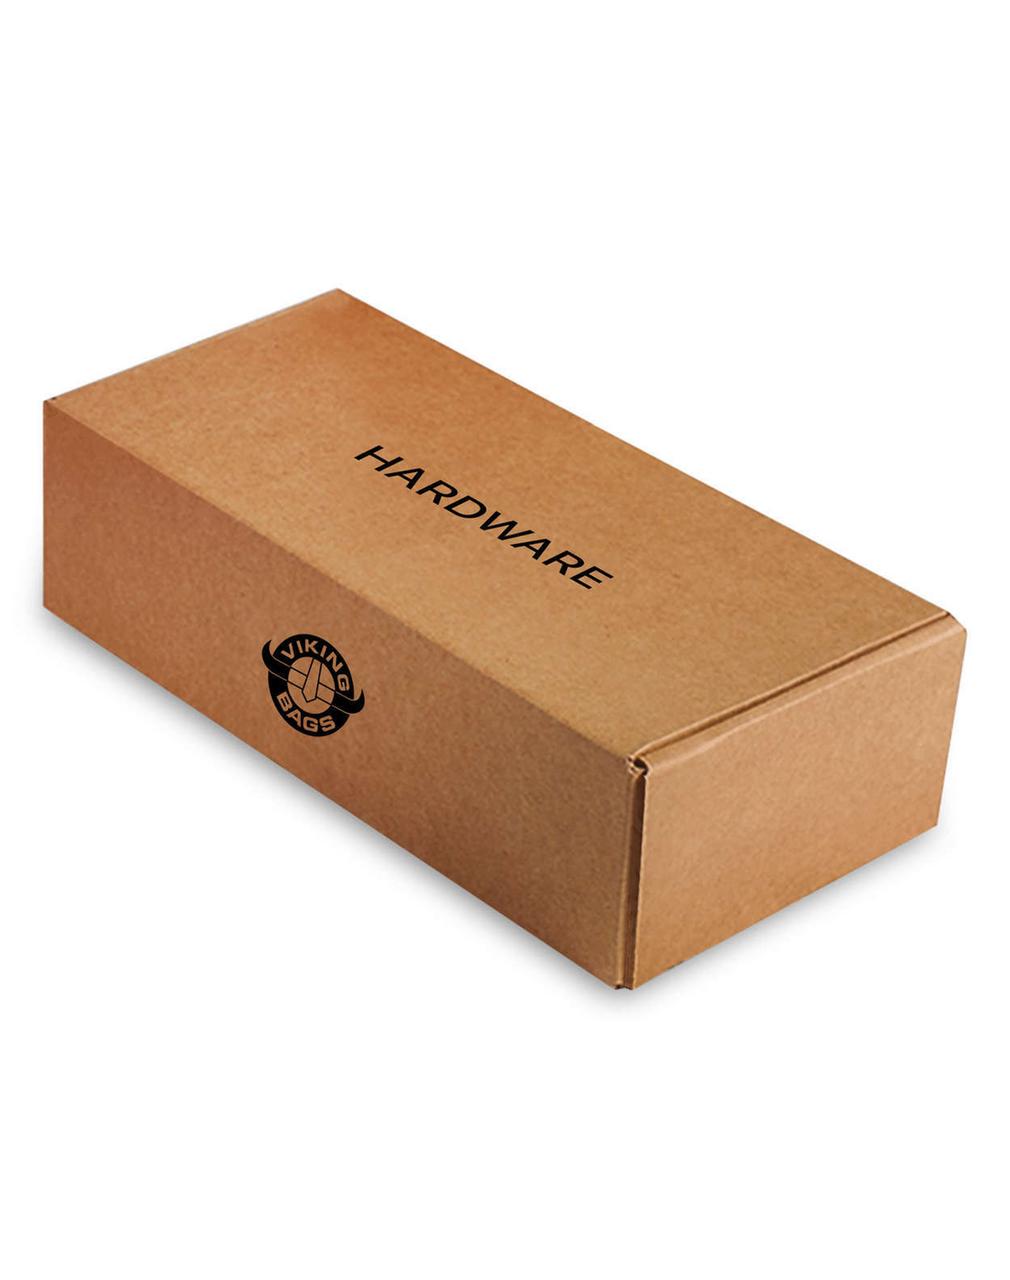 Honda 1500 Valkyrie Interstate Side Pocket Studded Motorcycle Saddlebags Hardware Box